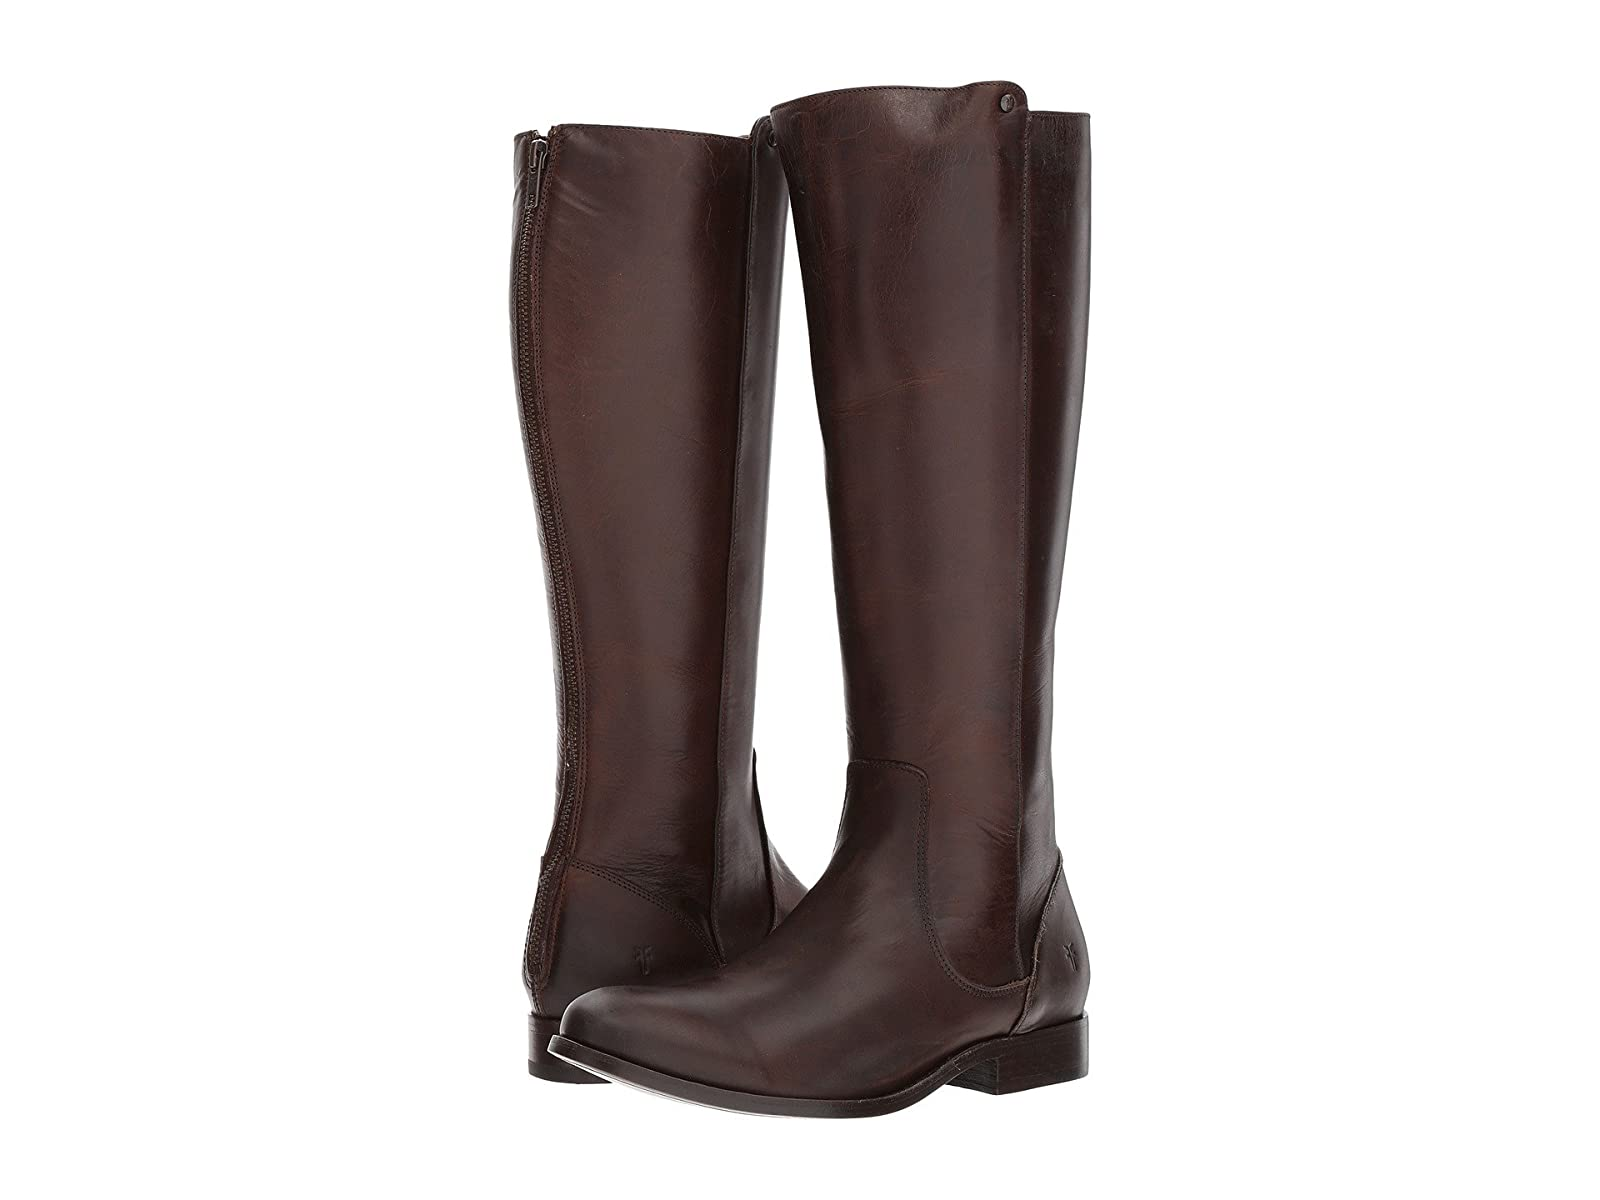 Frye Melissa Stud Back ZipCheap and distinctive eye-catching shoes